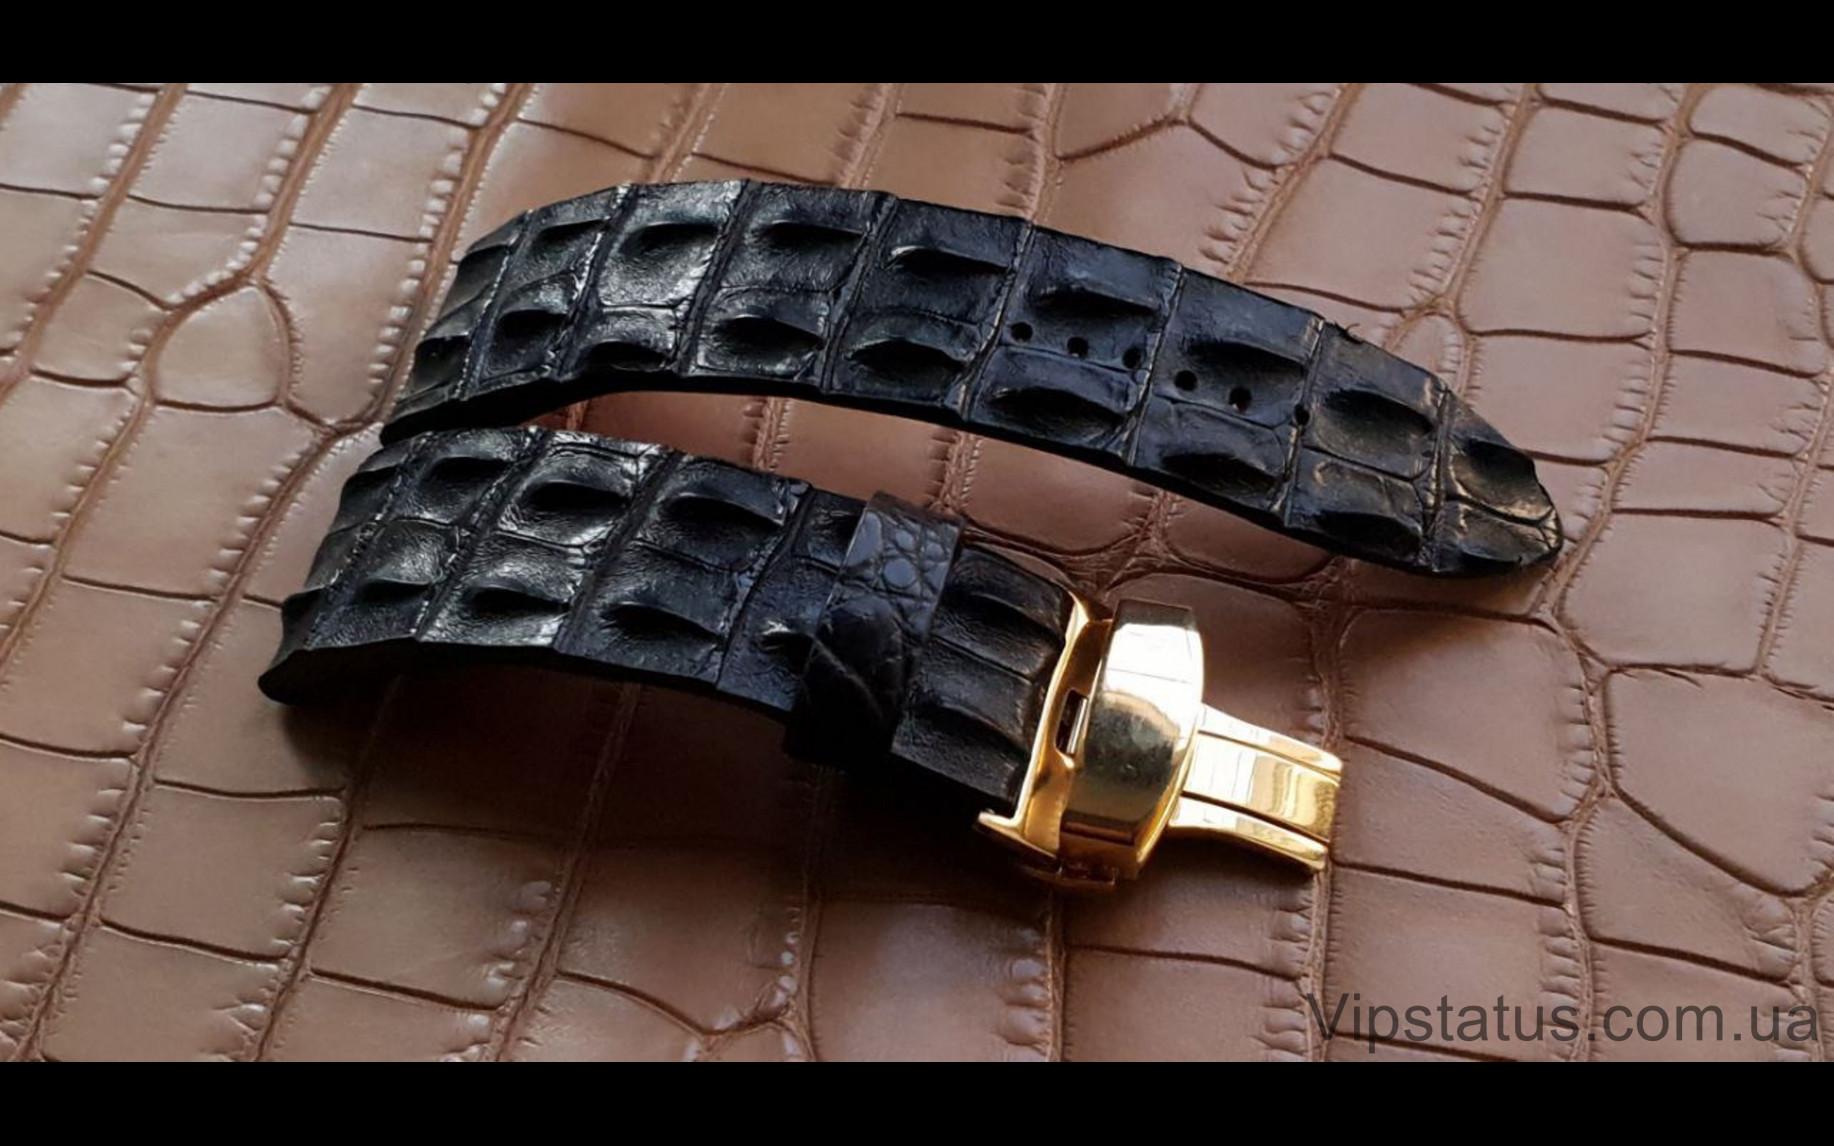 Elite Maurice Lacroix Эксклюзивный ремешок кожа крокодила Maurice Lacroix Exclusive Crocodile Strap image 3